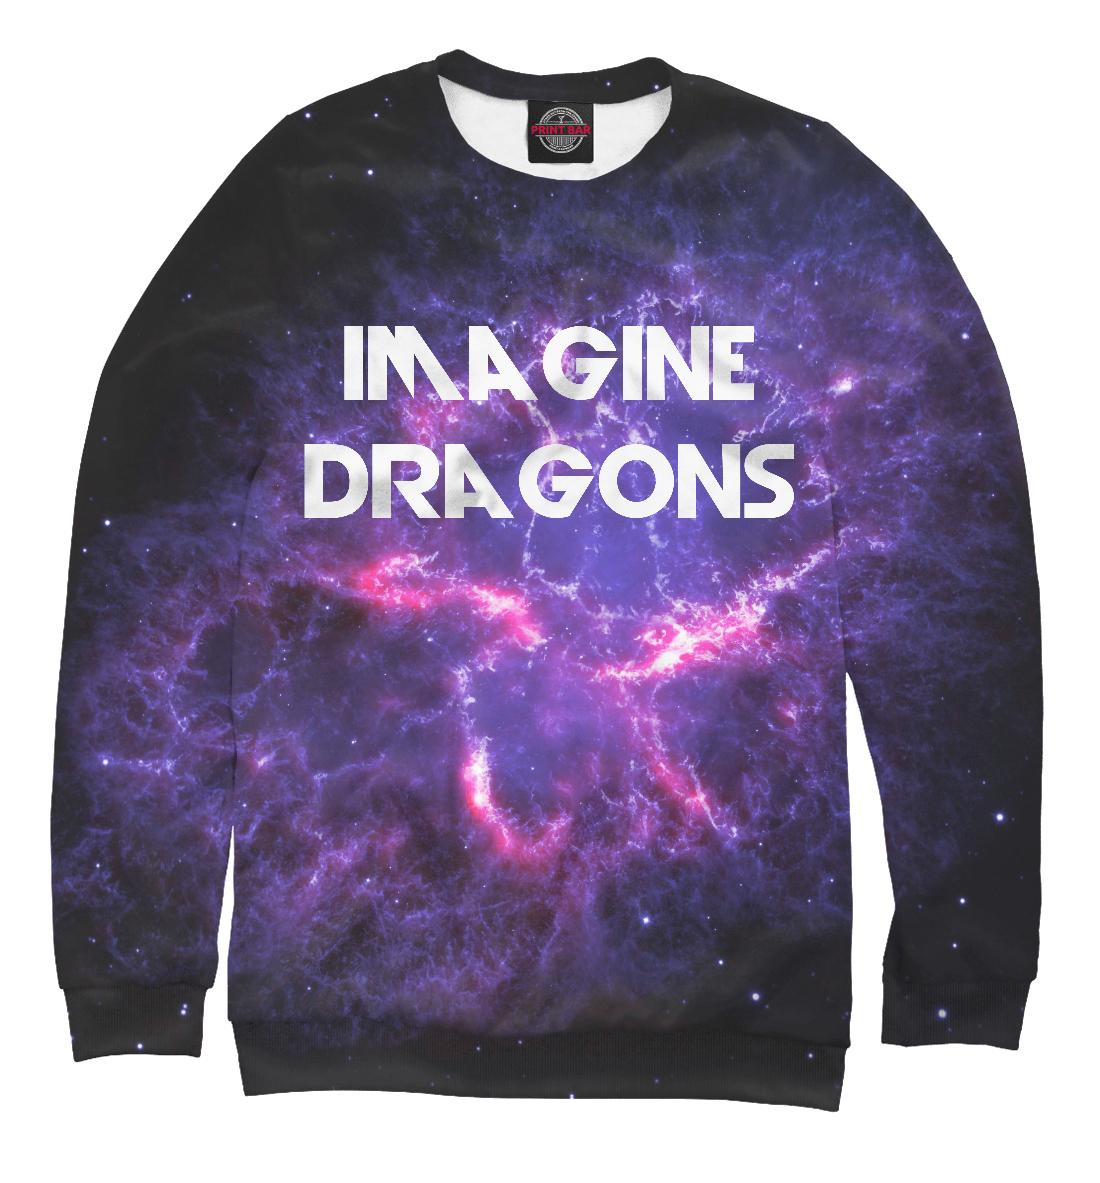 Купить Imagine Dragons in Stars, Printbar, Свитшоты, IMA-413813-swi-1